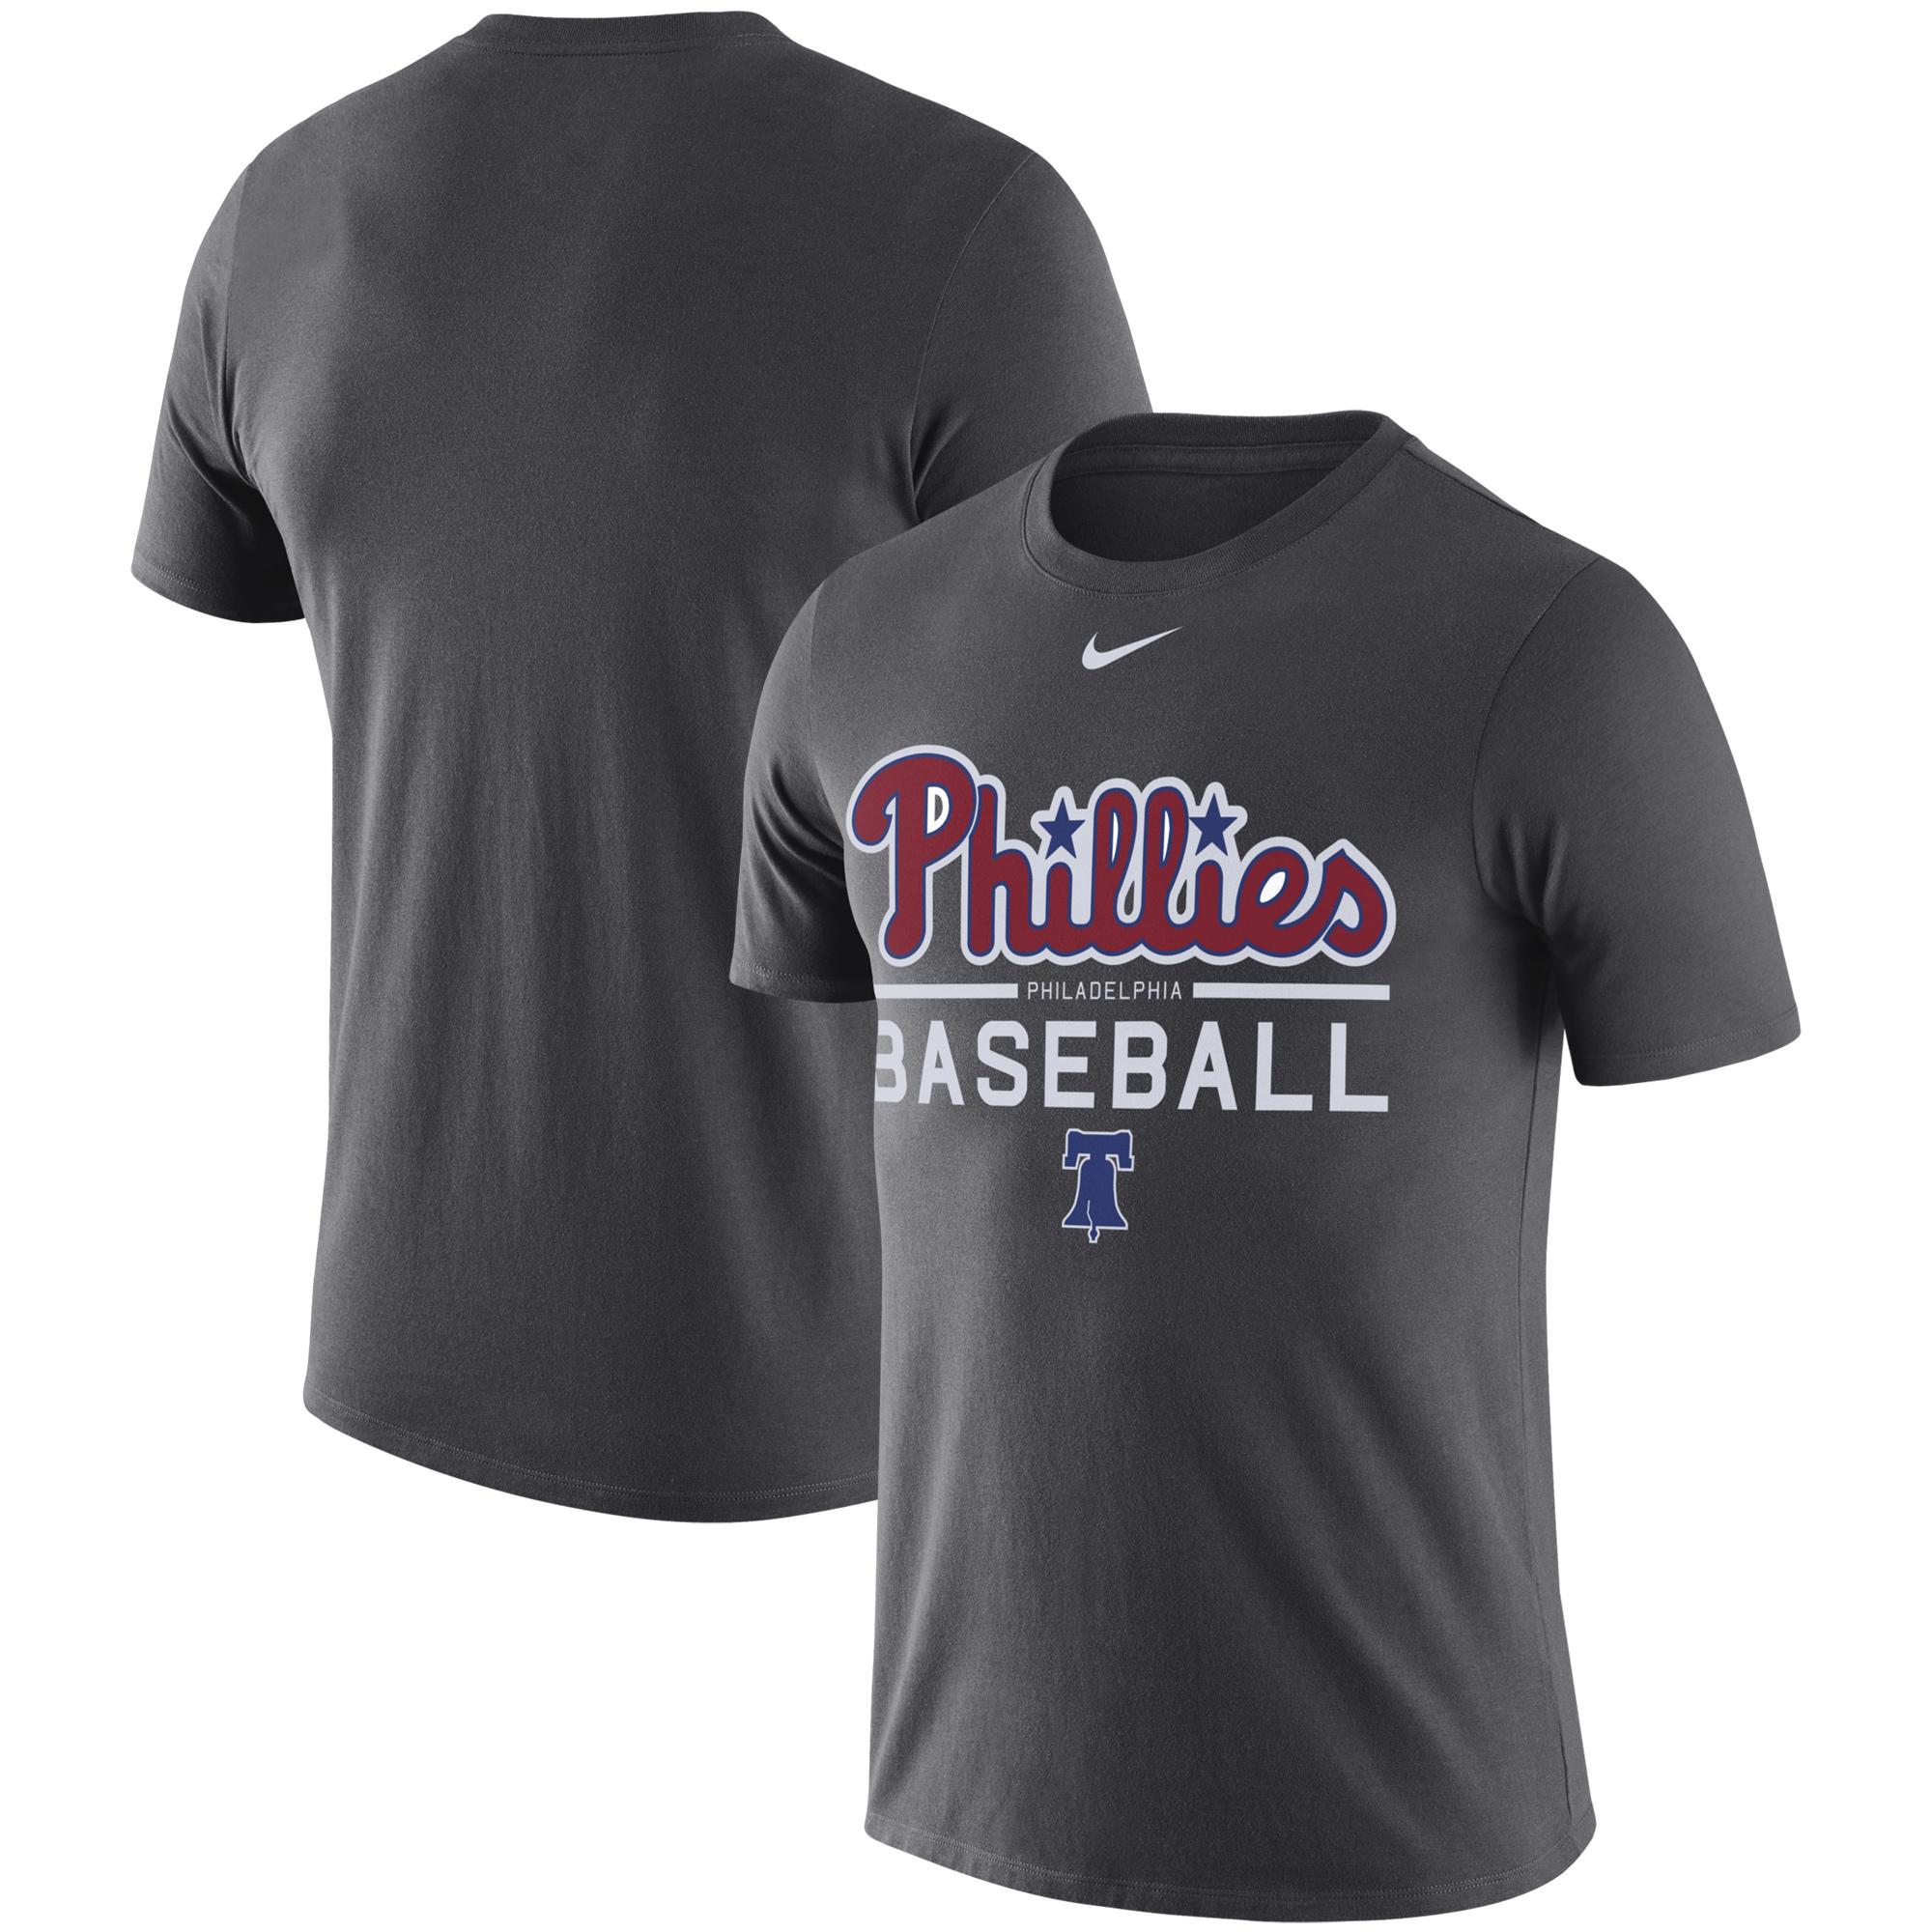 Philadelphia Phillies Nike Practice Performance T-Shirt - Anthracite - 3XL